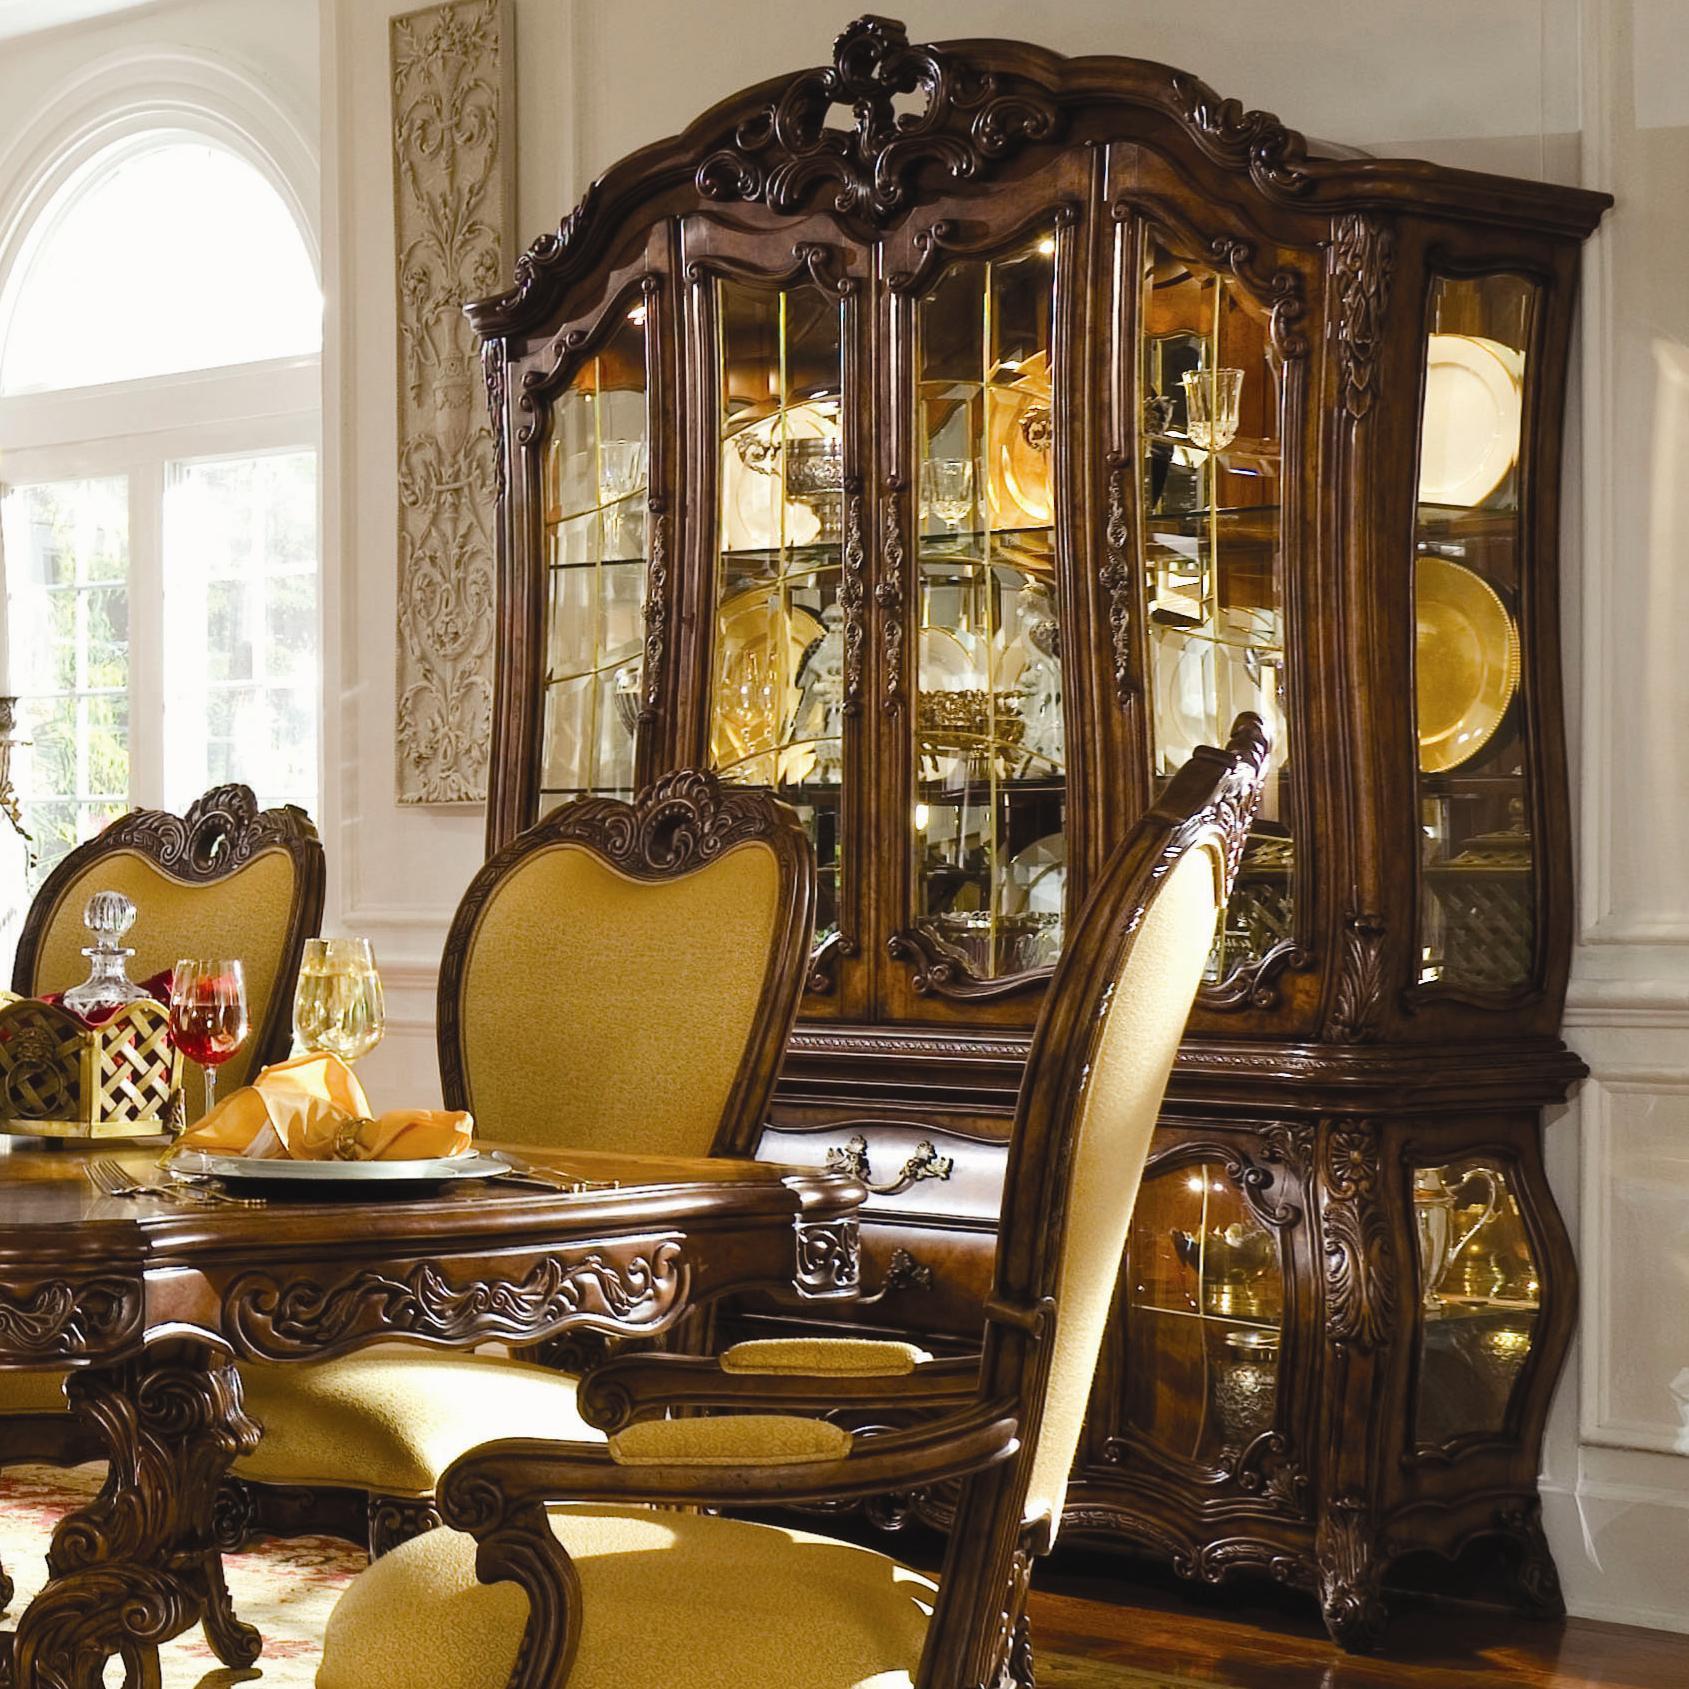 Michael Amini Palais Royale China Cabinet with Beveled Glass Doors ...